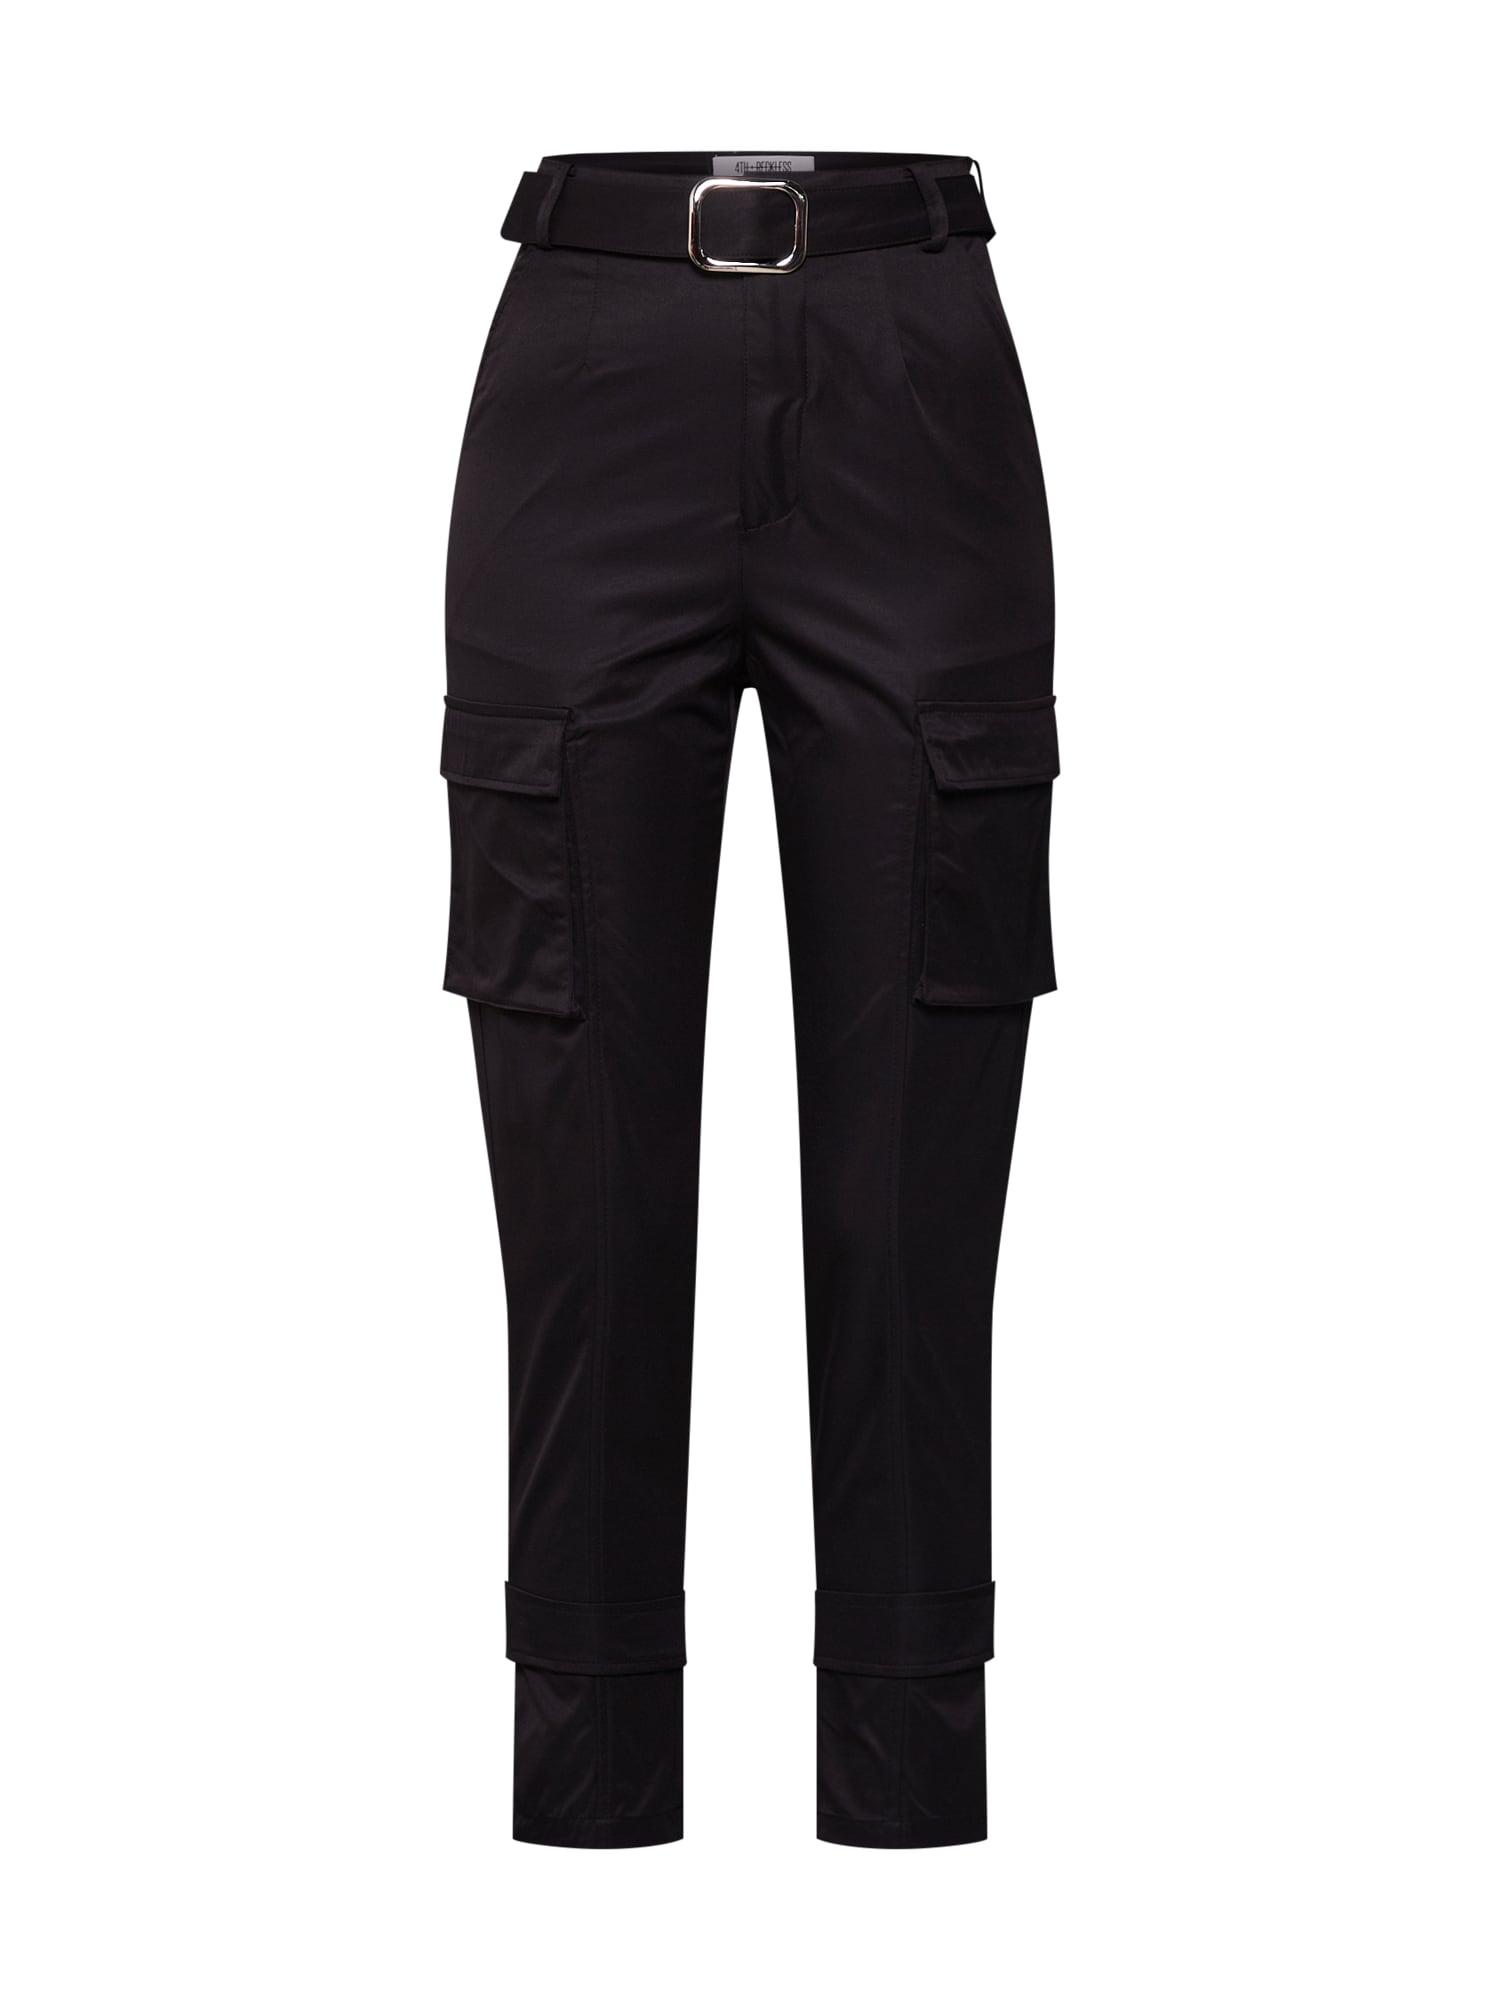 4th & Reckless Laisvo stiliaus kelnės 'SCRIPT' juoda